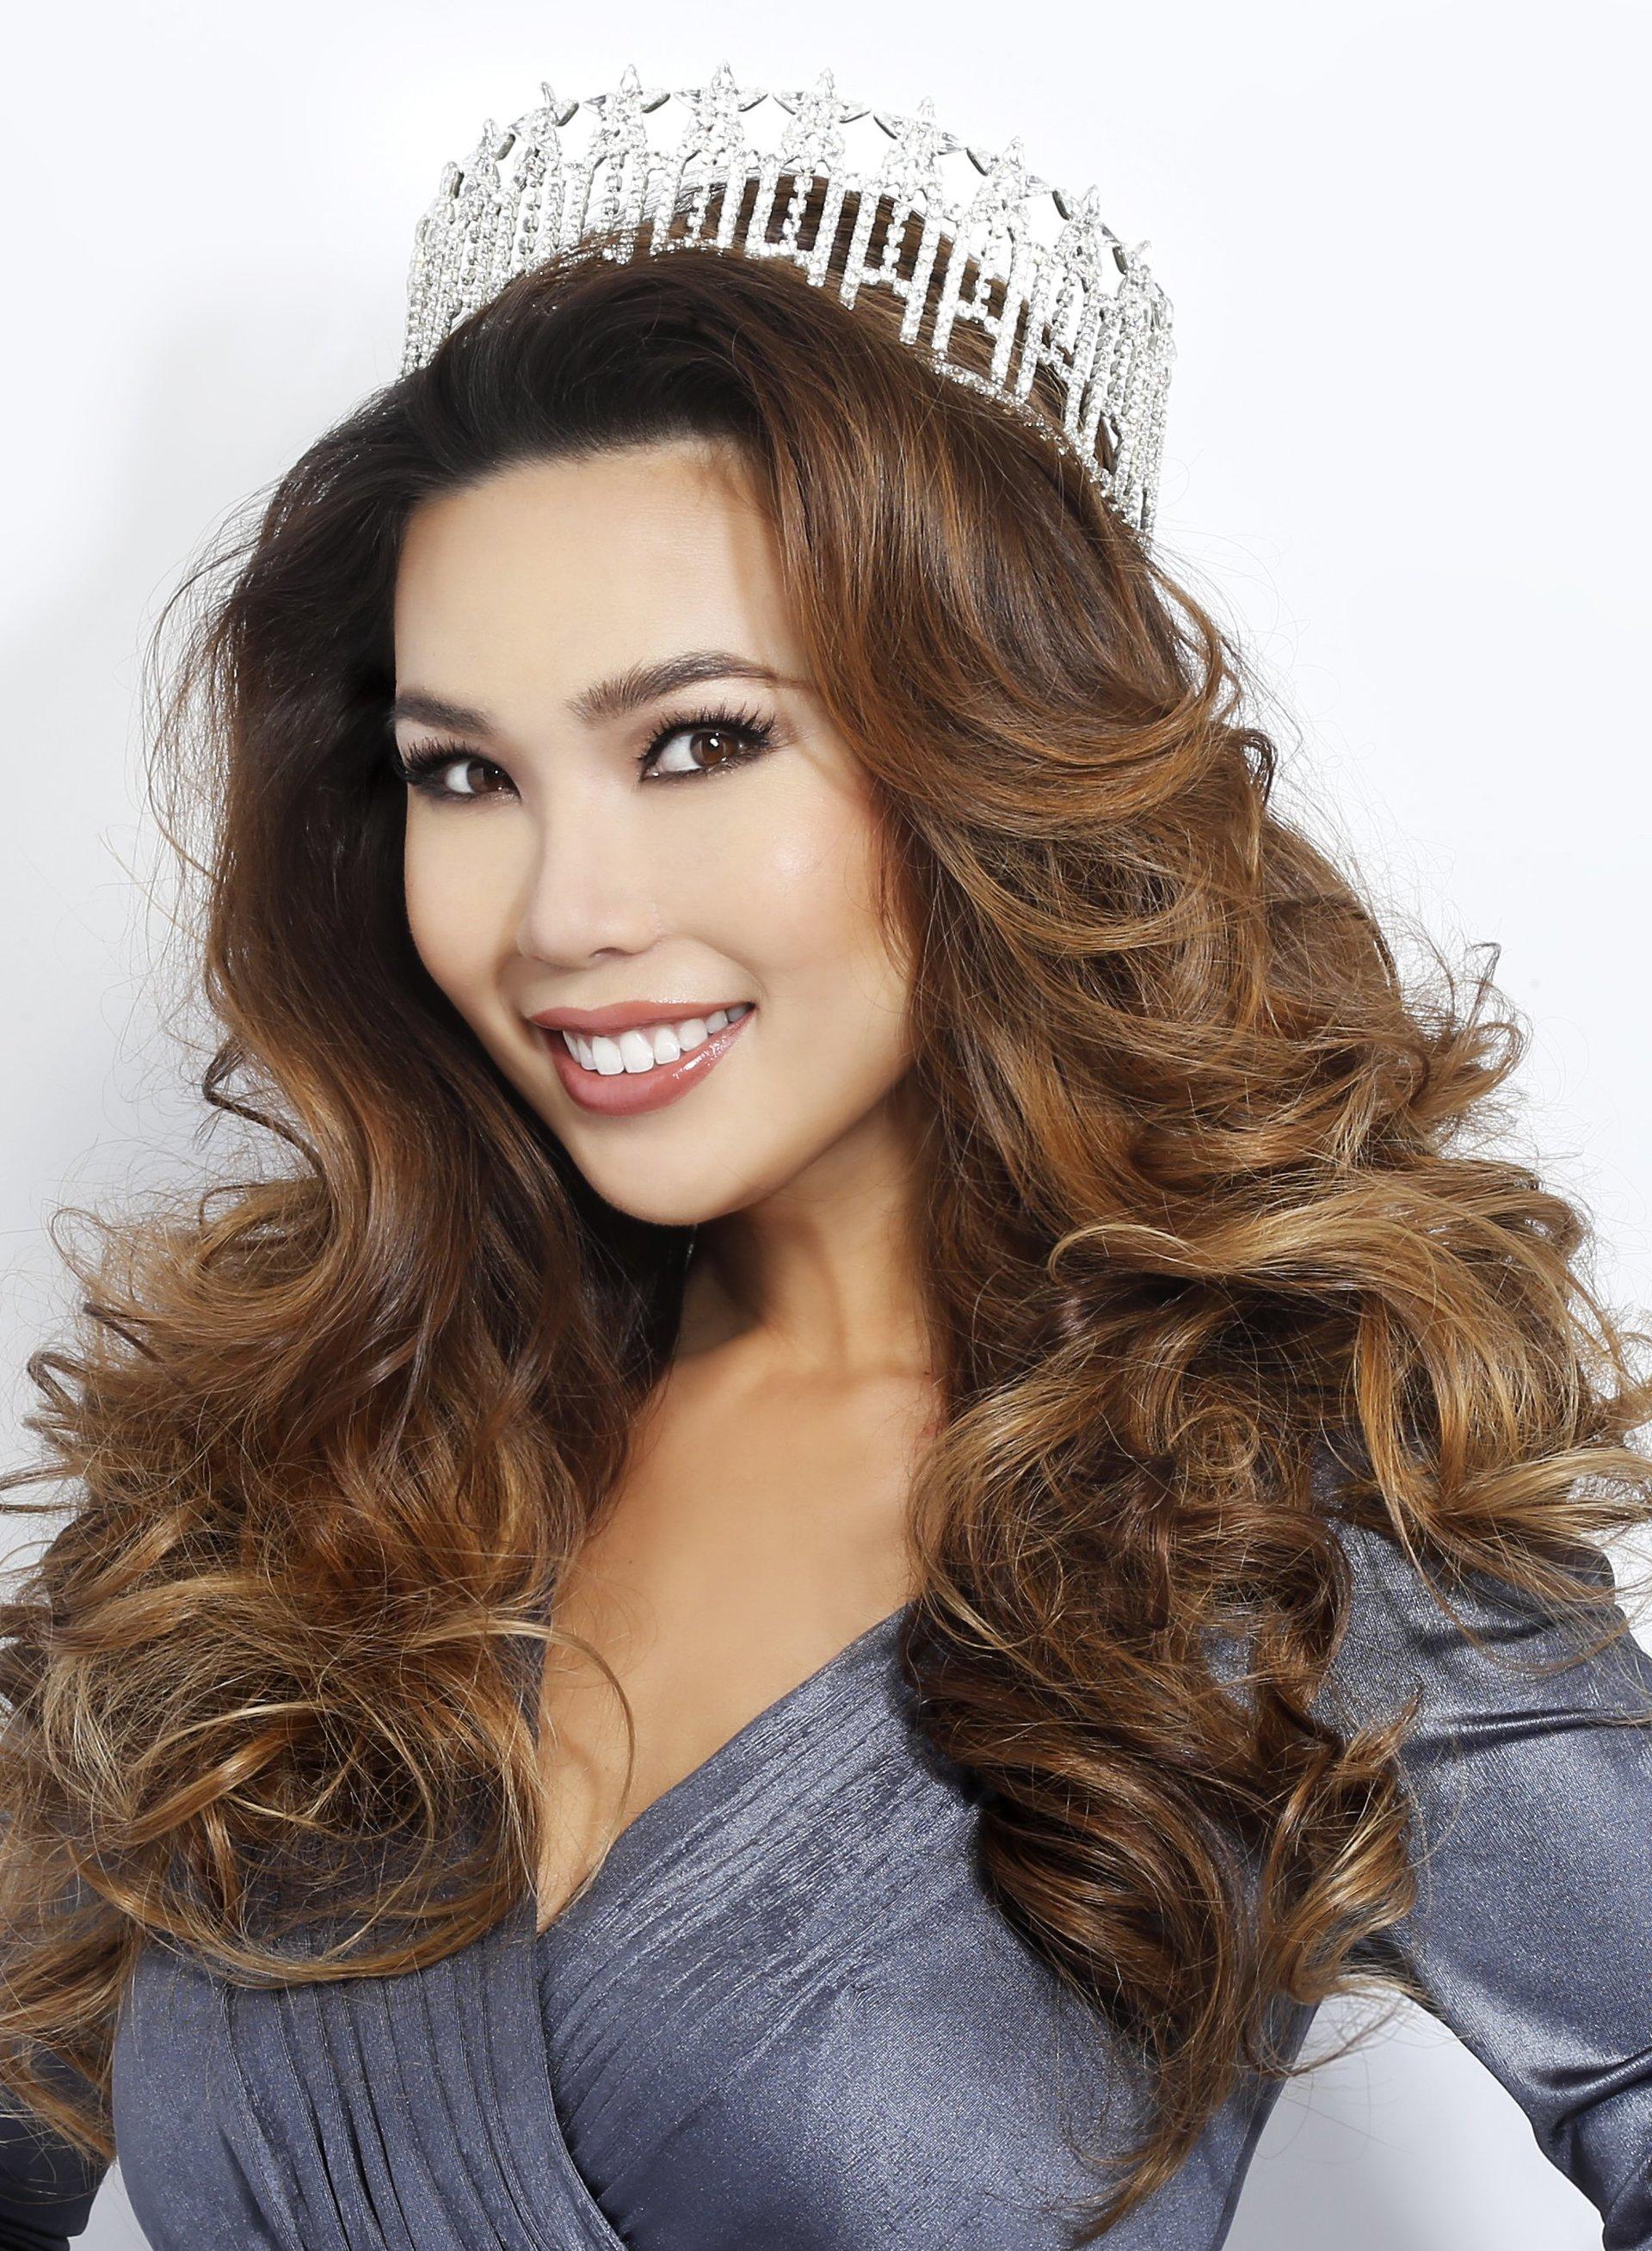 2015 Emma Wo (Top 10 at Miss USA)